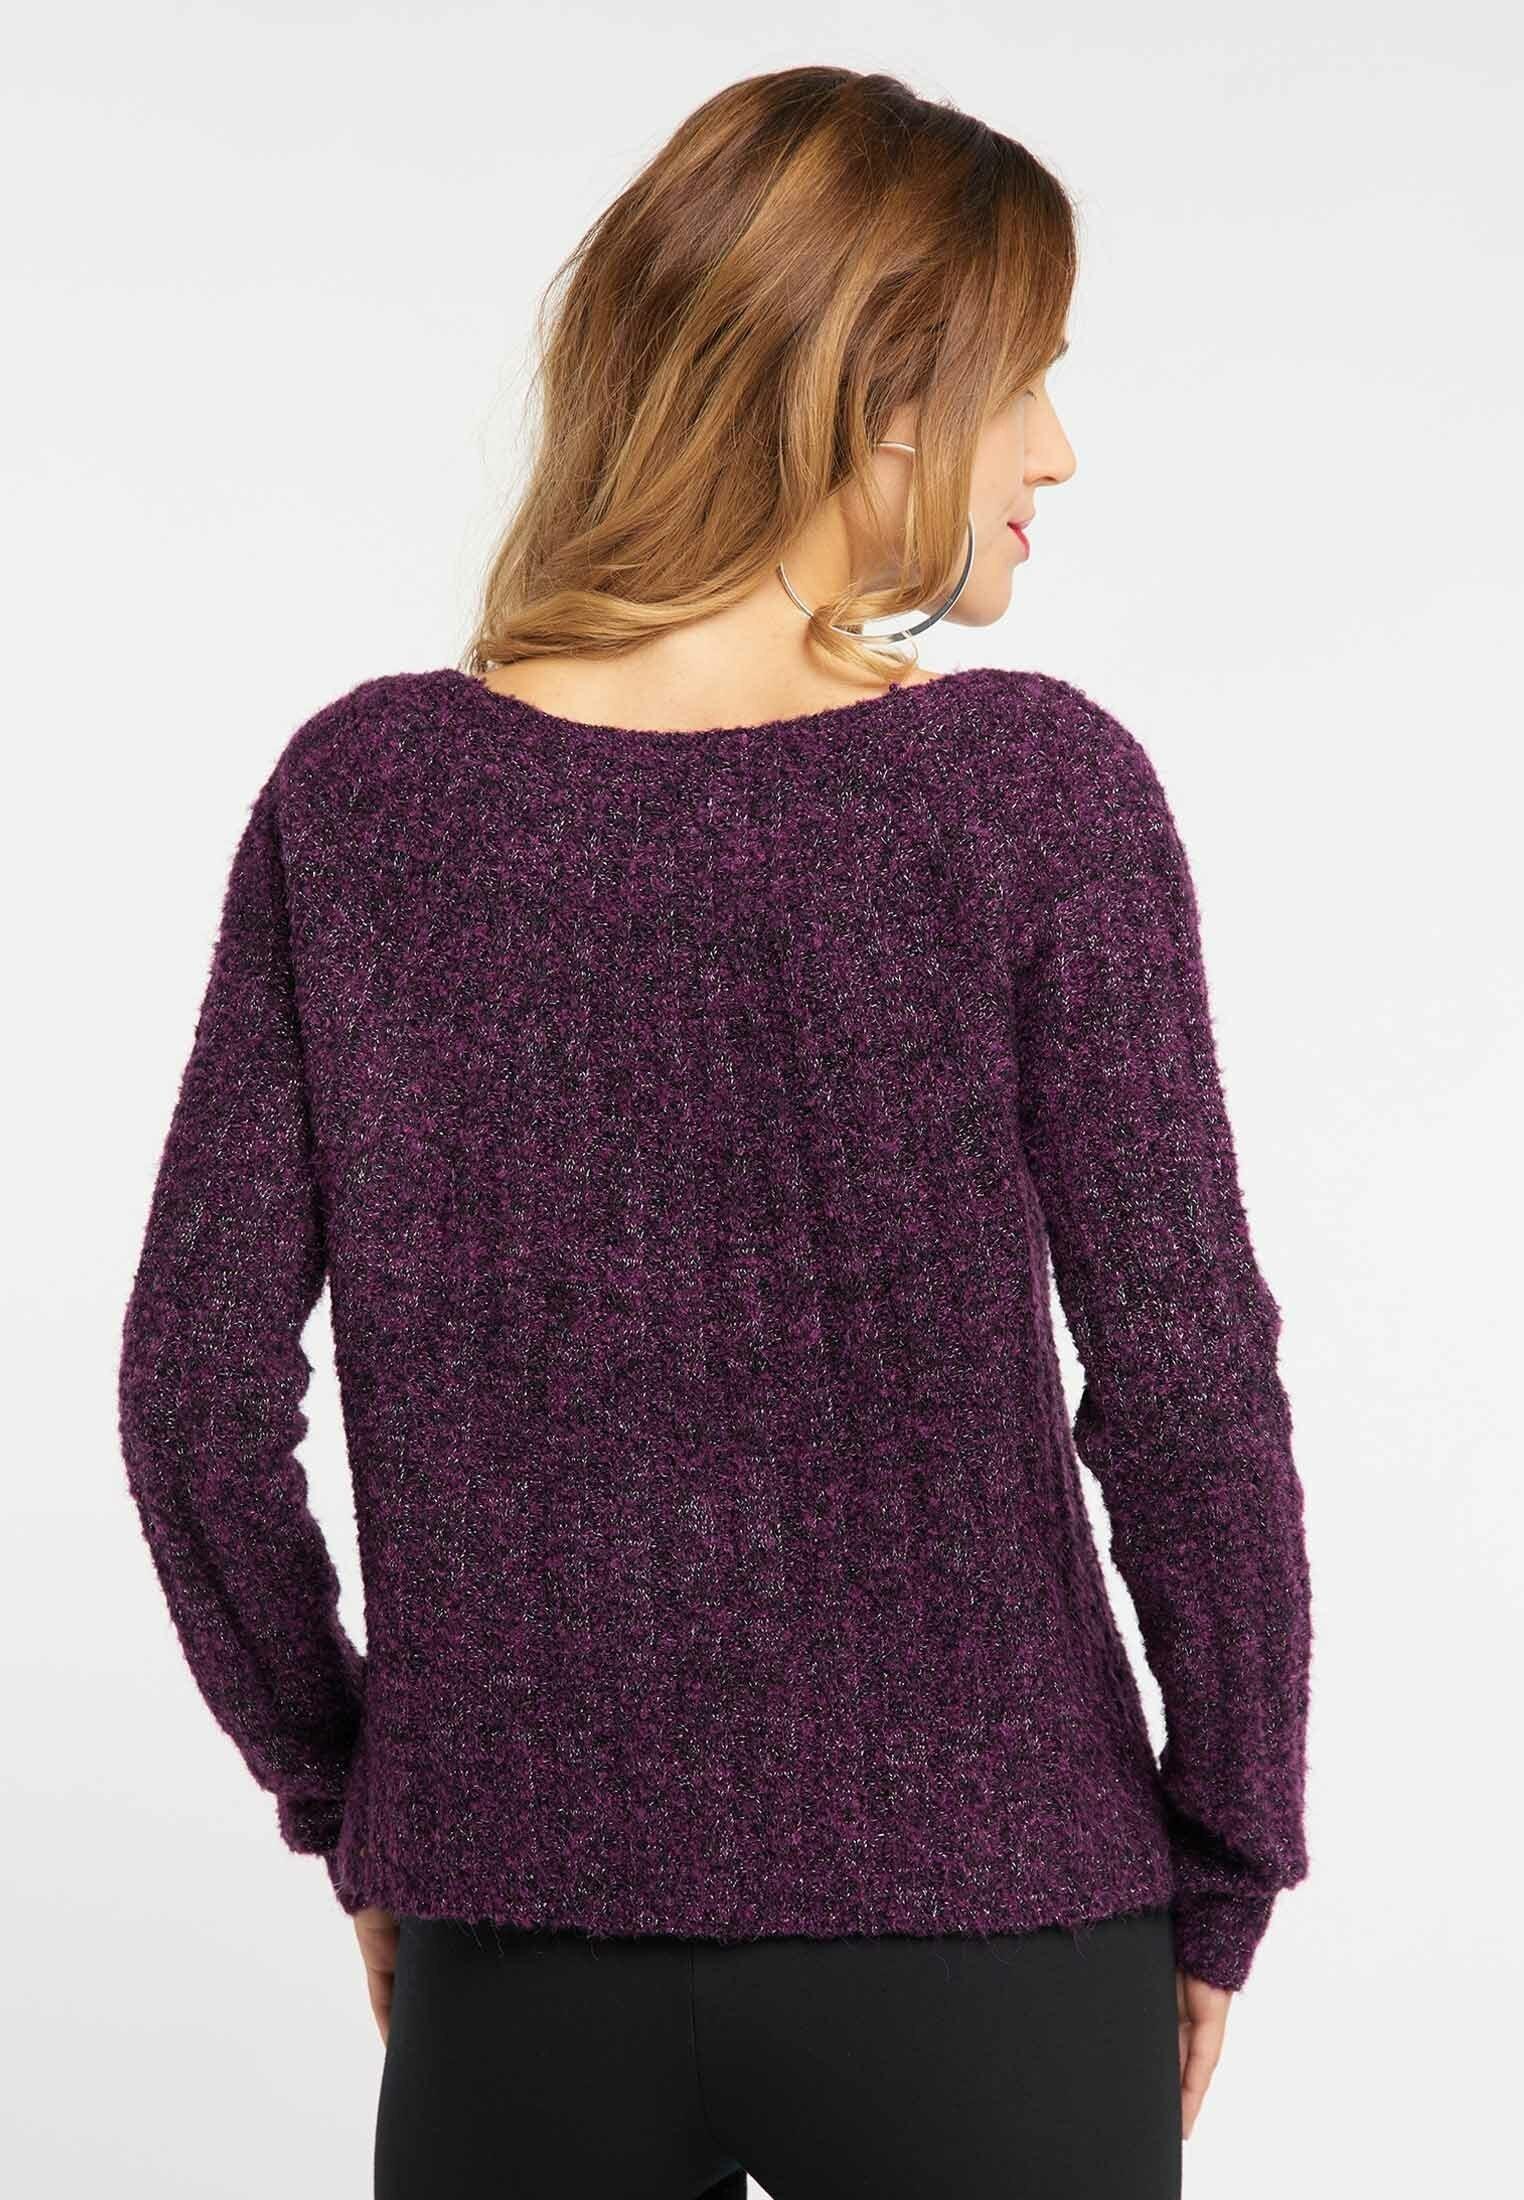 High-Quality Cheap Women's Clothing faina Jumper purple hitnMhgHX